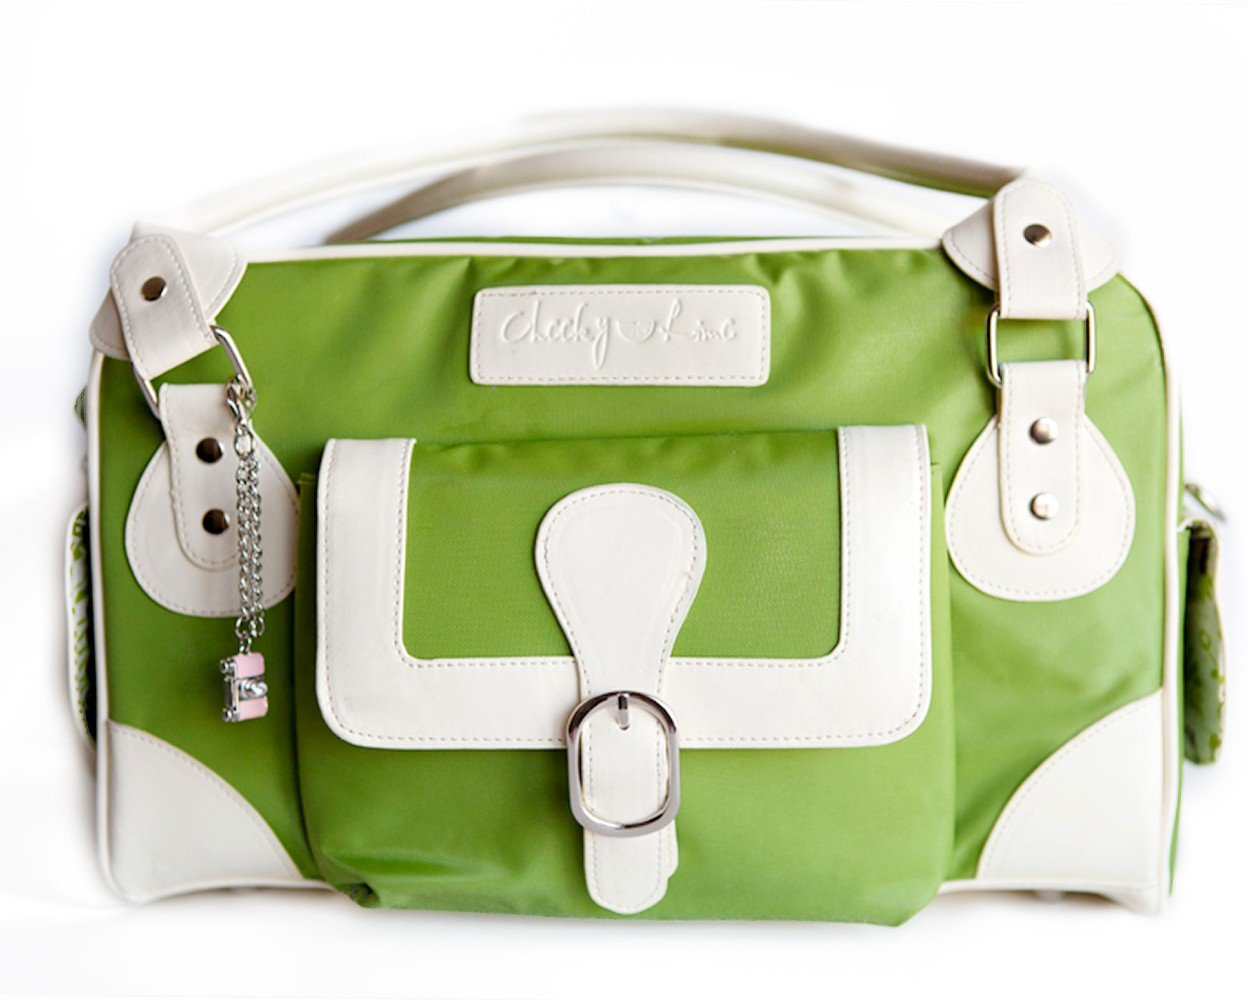 Cheeky Lime Classic Bag - green